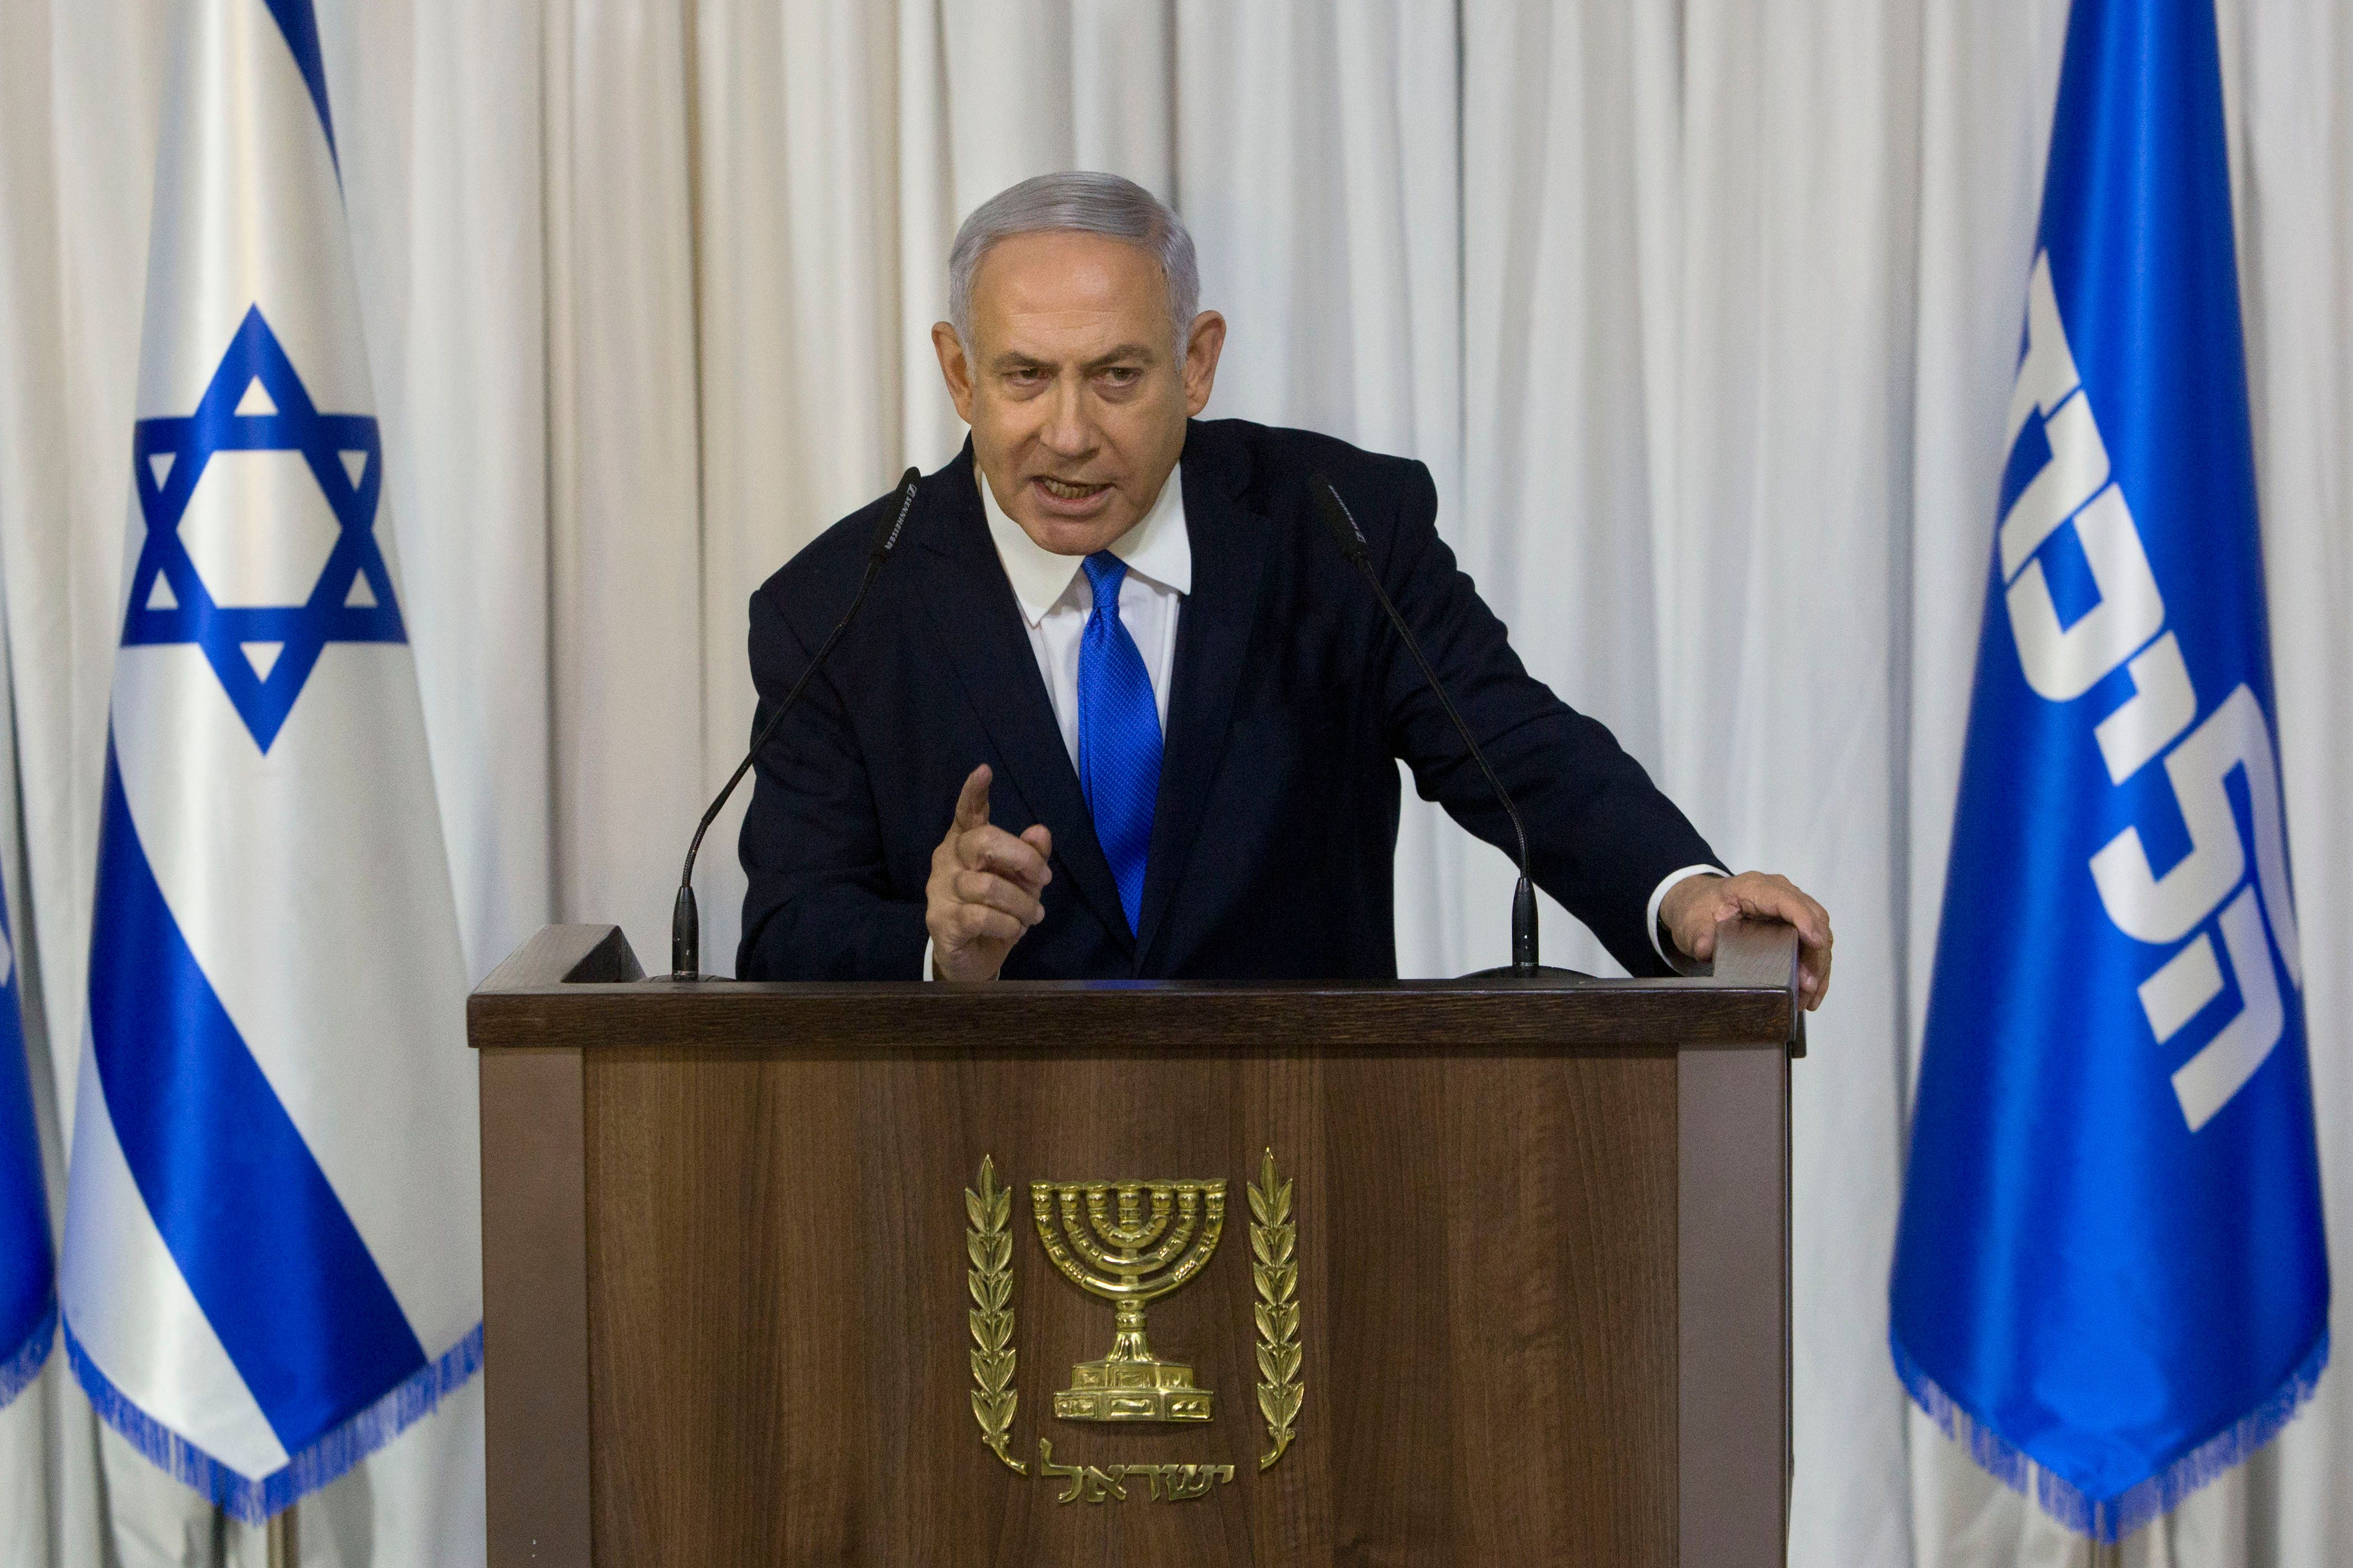 Israeli Prime Minister Benjamin Netanyahu gestures as he delivers a statement in Ramat Gan, Israel, Thursday, Feb. 21, 2019. (AP Photo/Sebastian Scheiner)